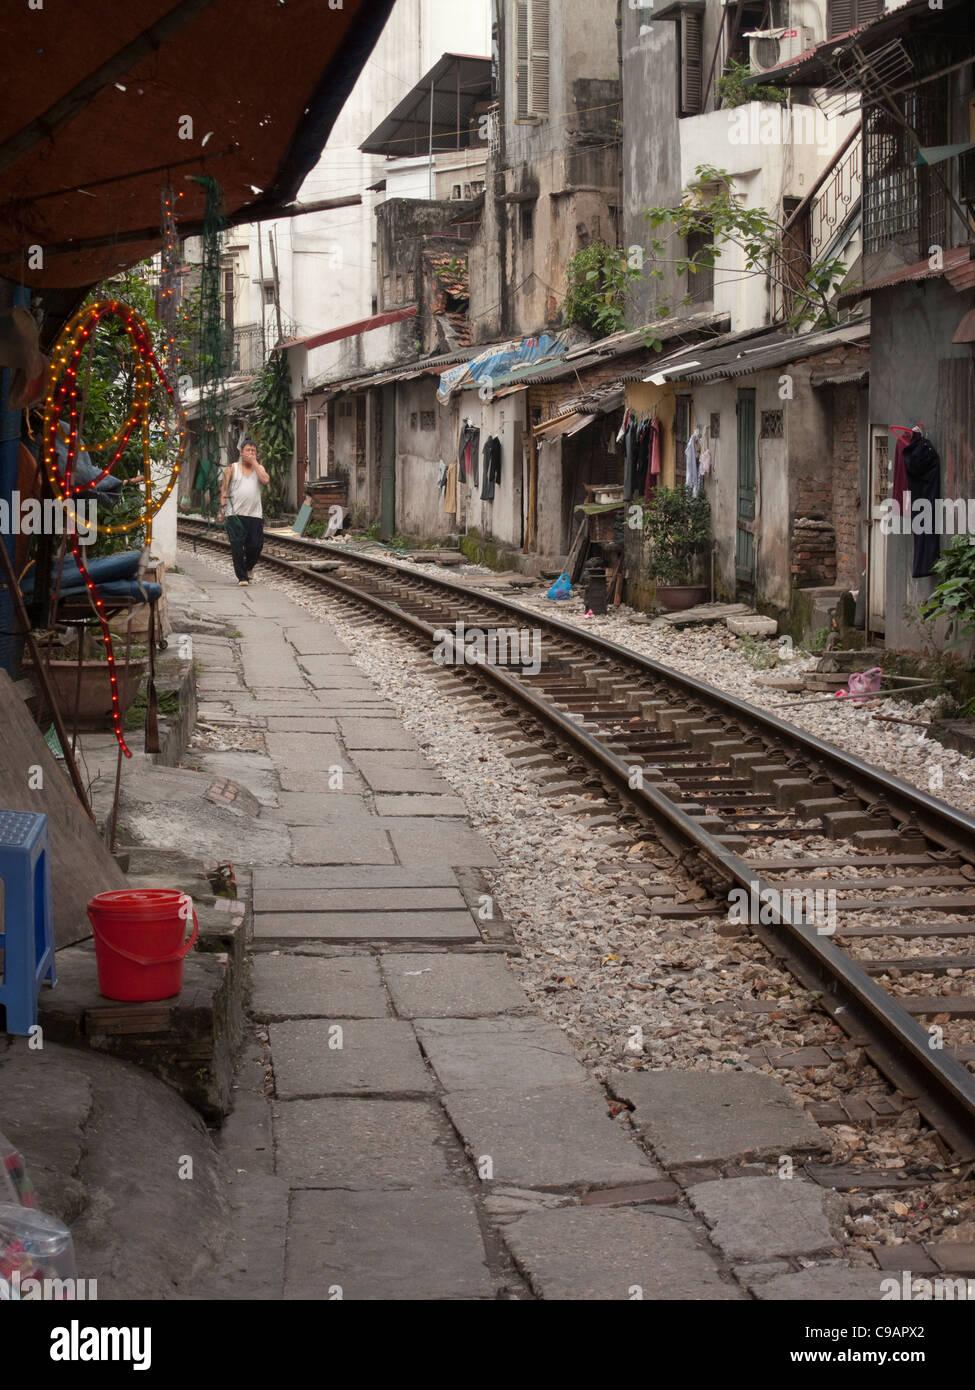 Rail track through housing in Hanoi, Vietnam - Stock Image